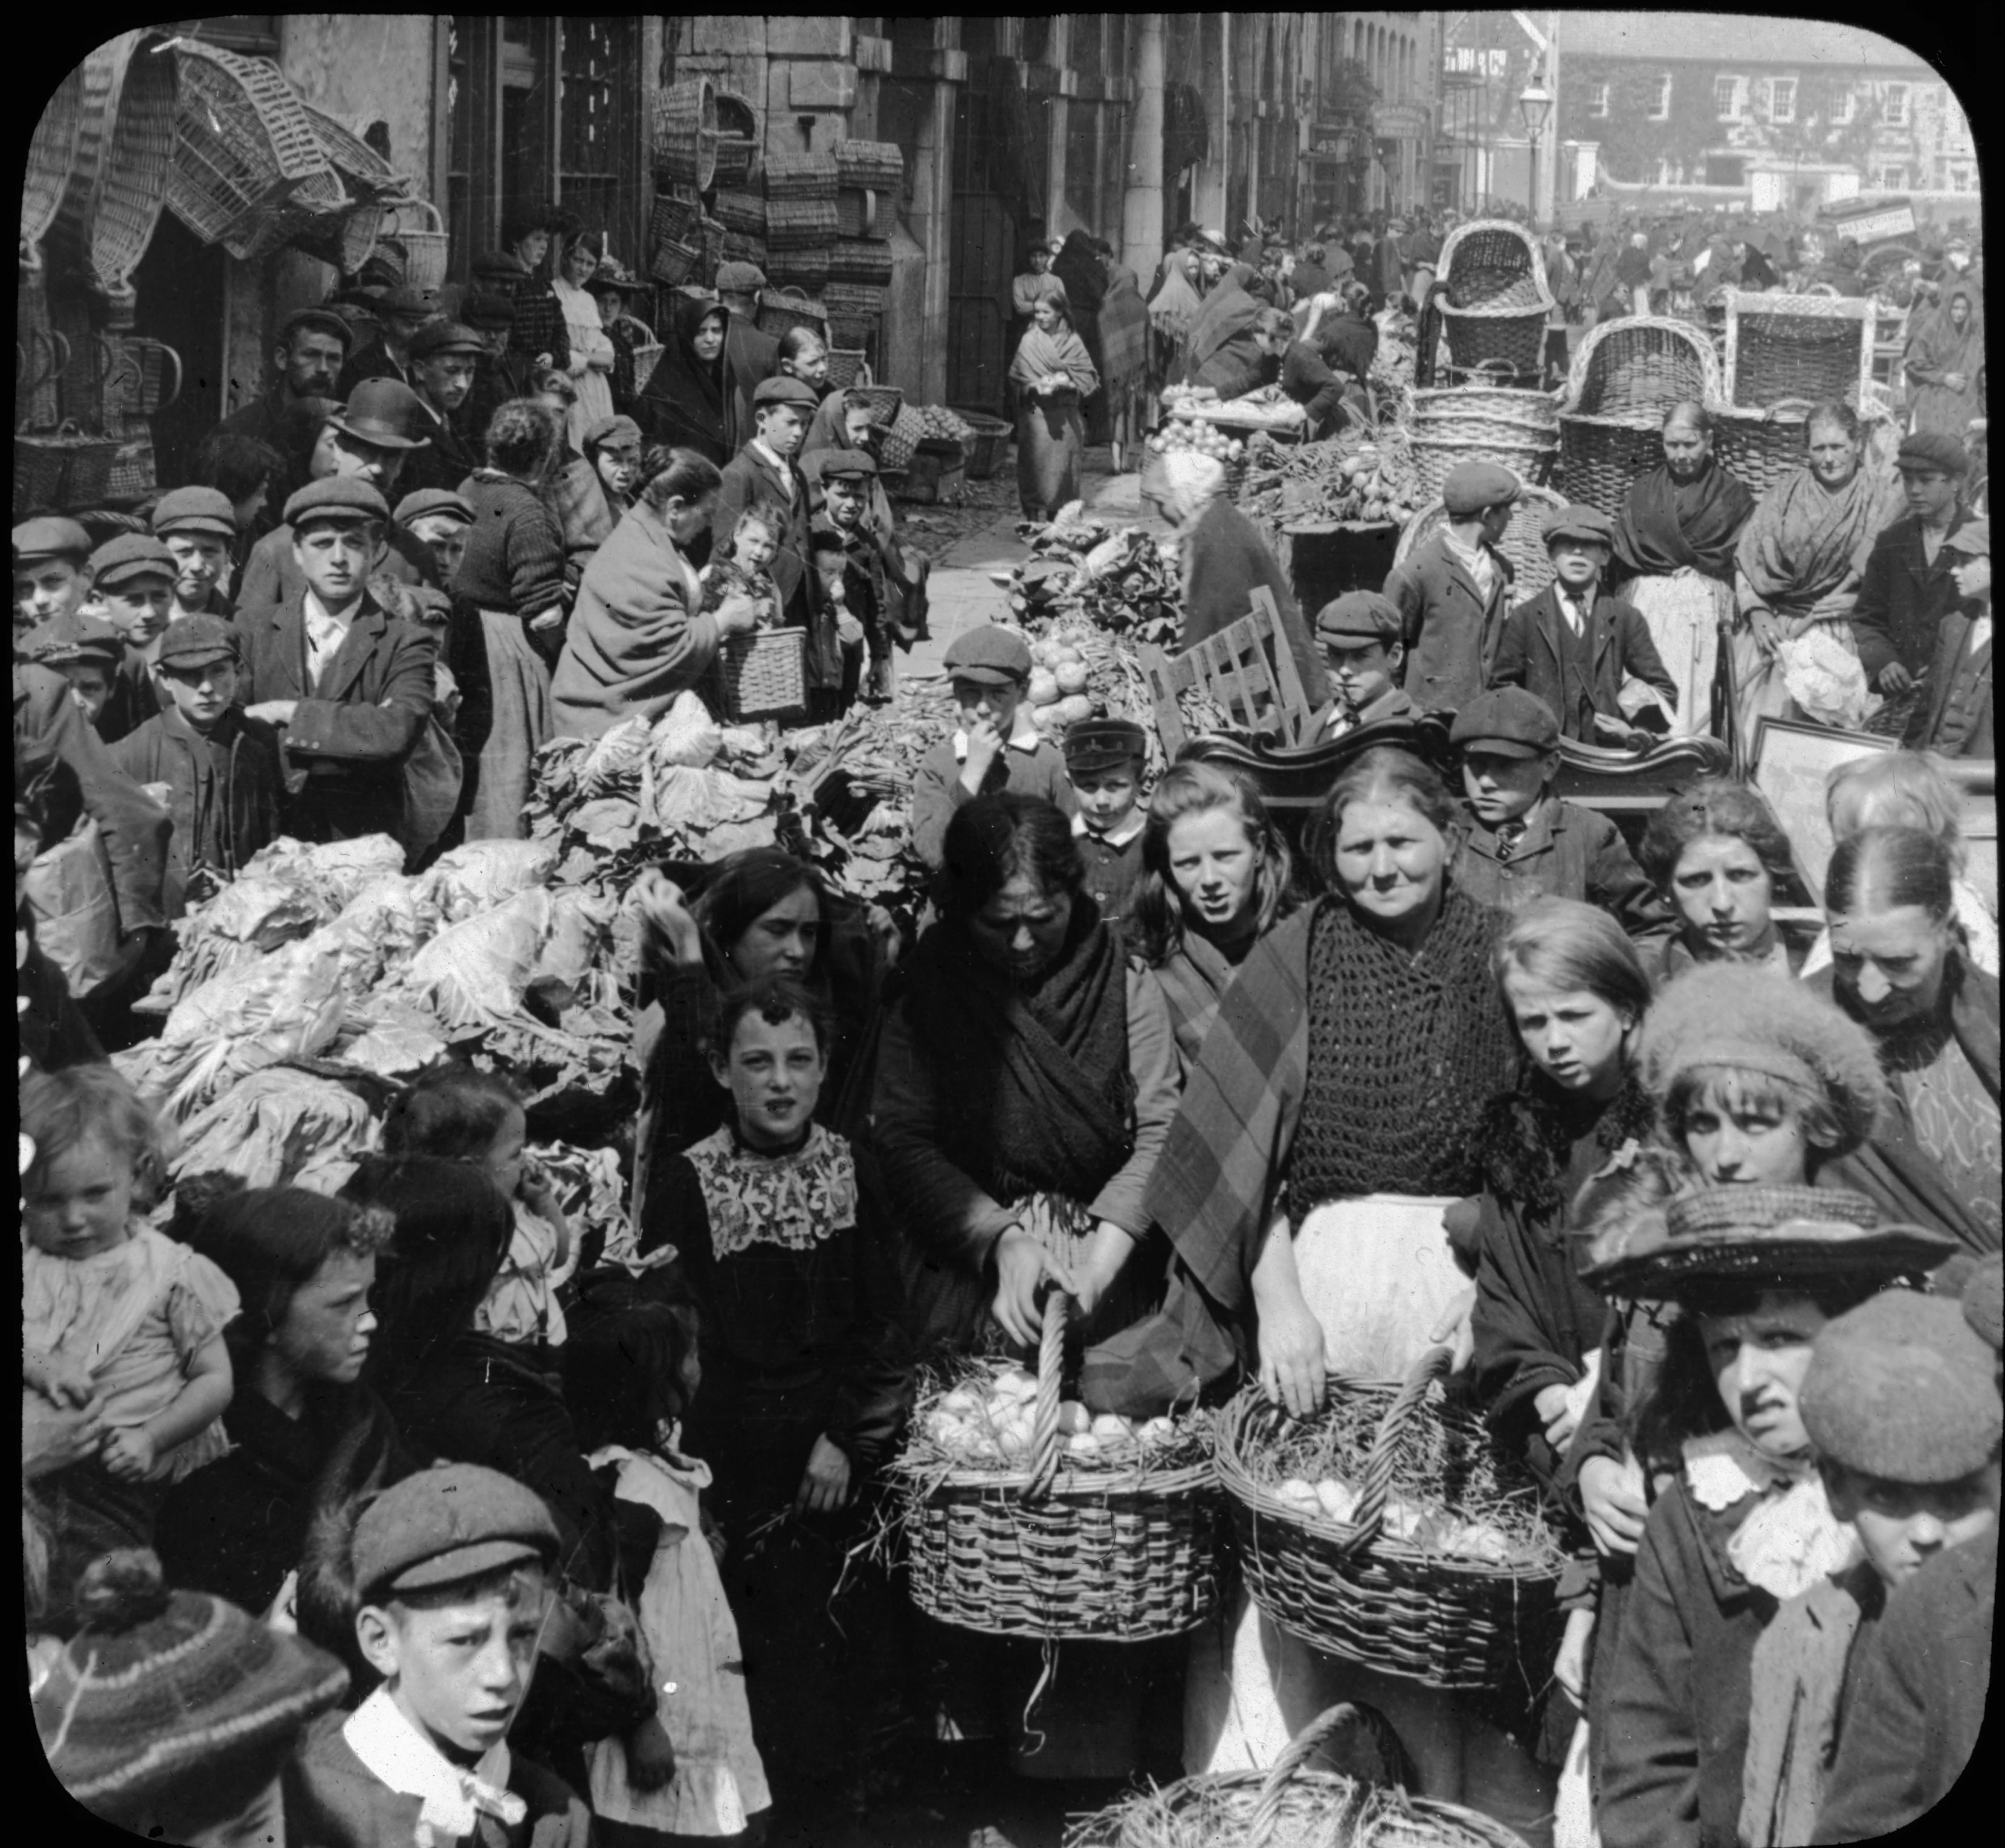 Street Market in Cork, Ireland.